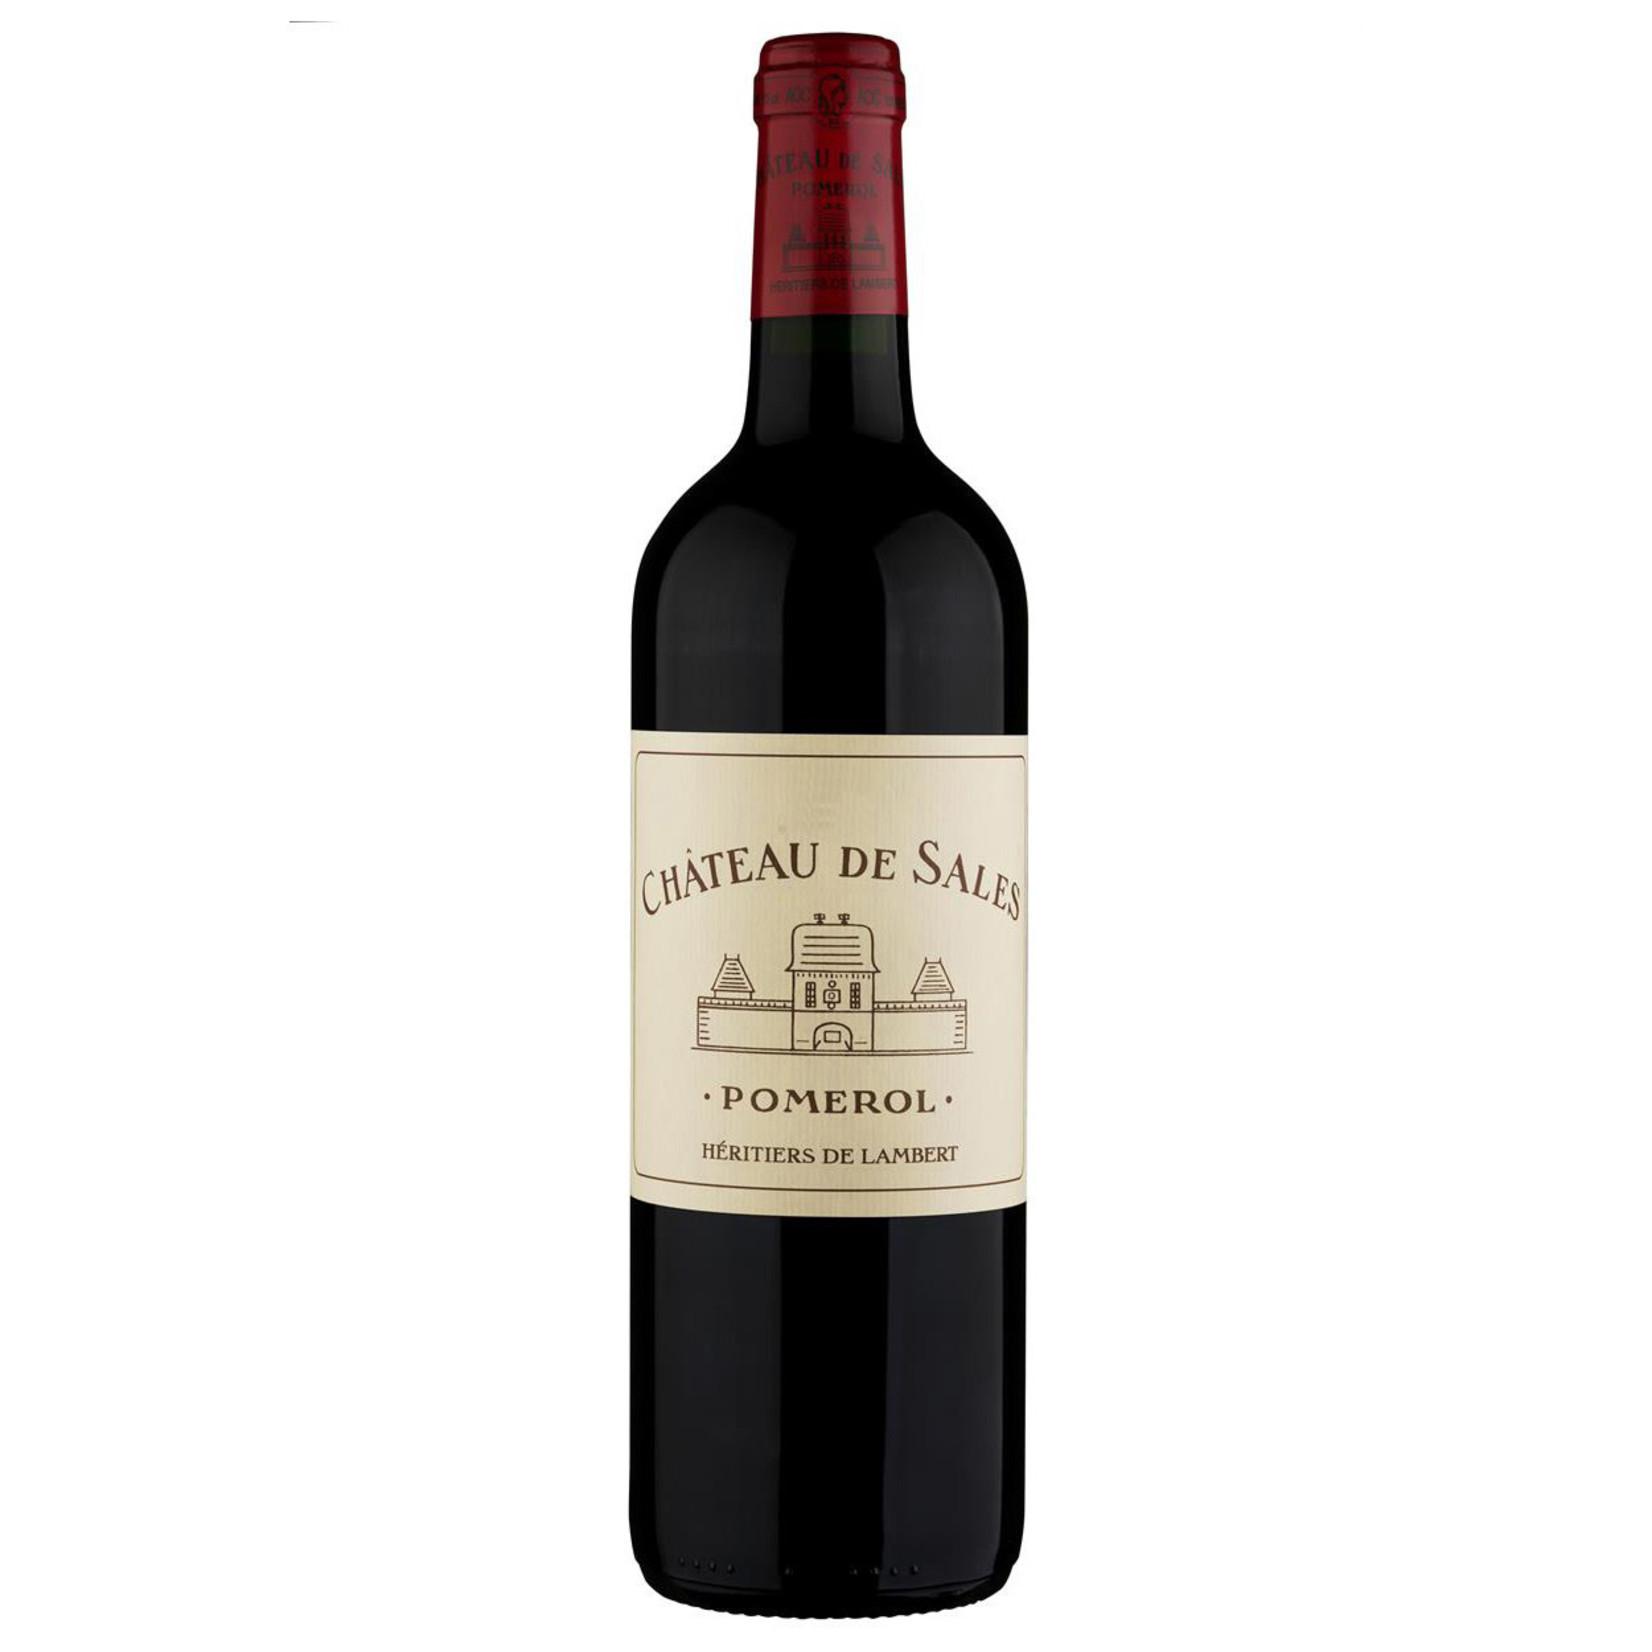 Wine Chateau de Sales Pomerol 2014